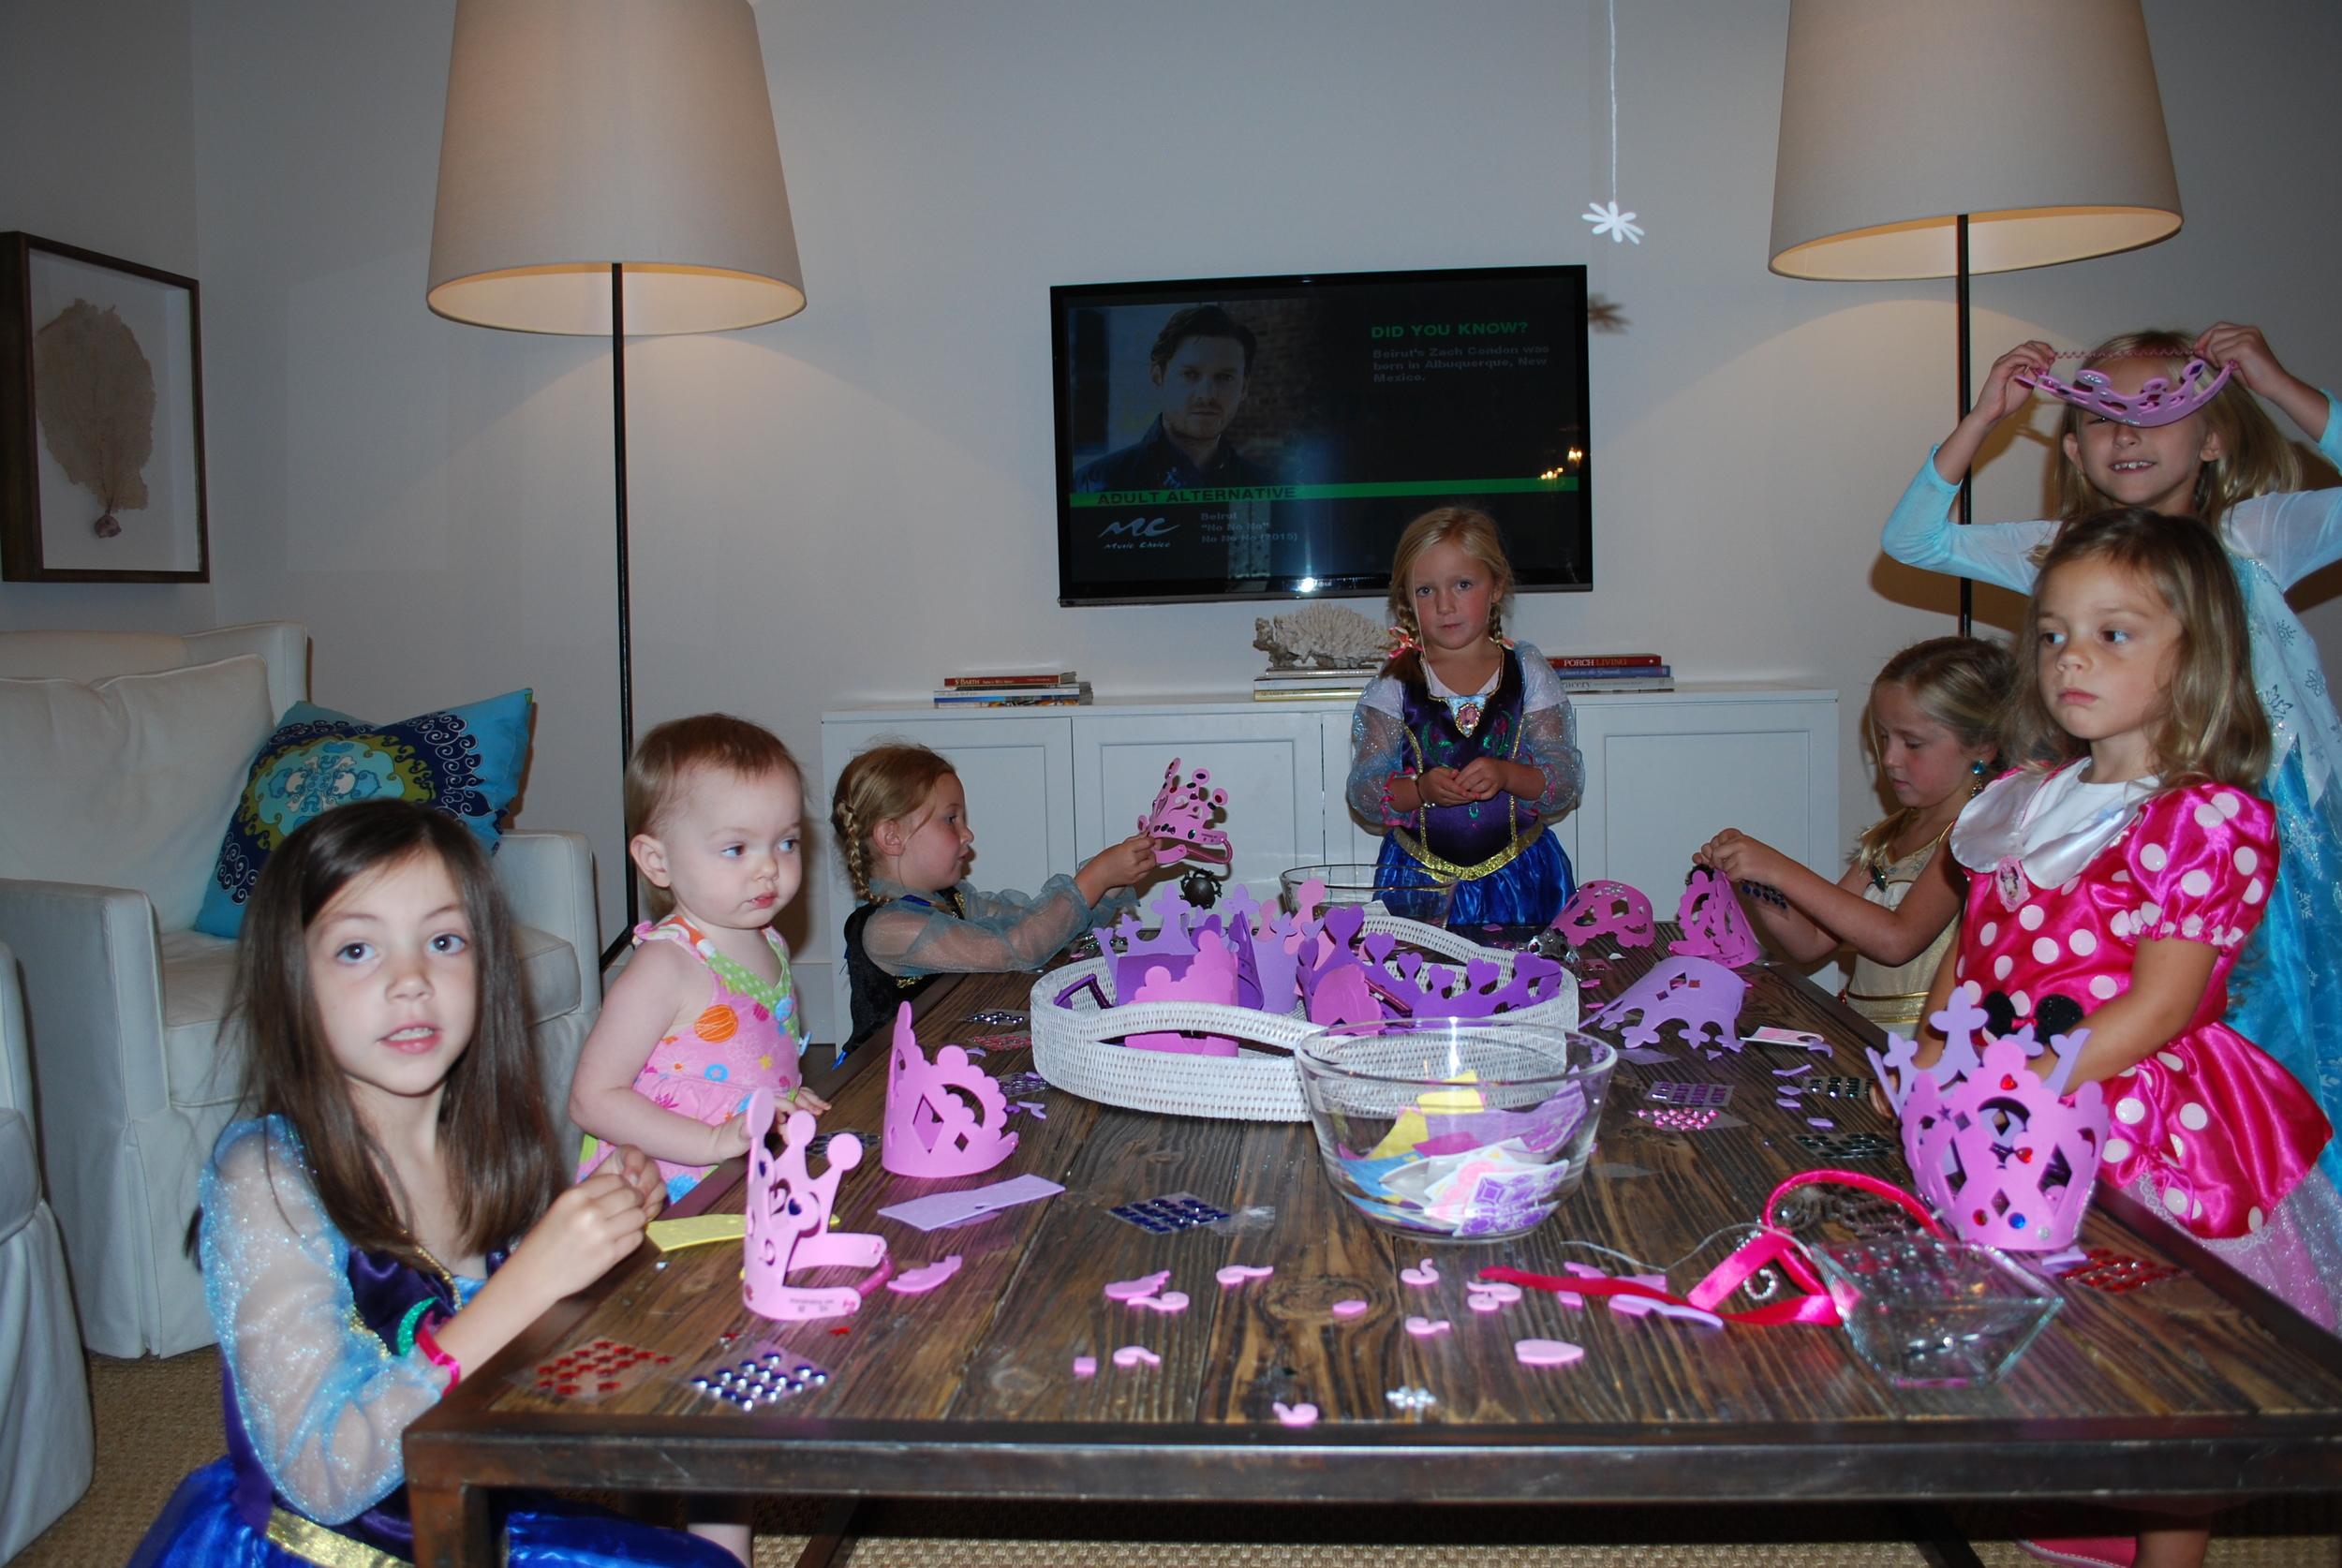 We made princess crowns